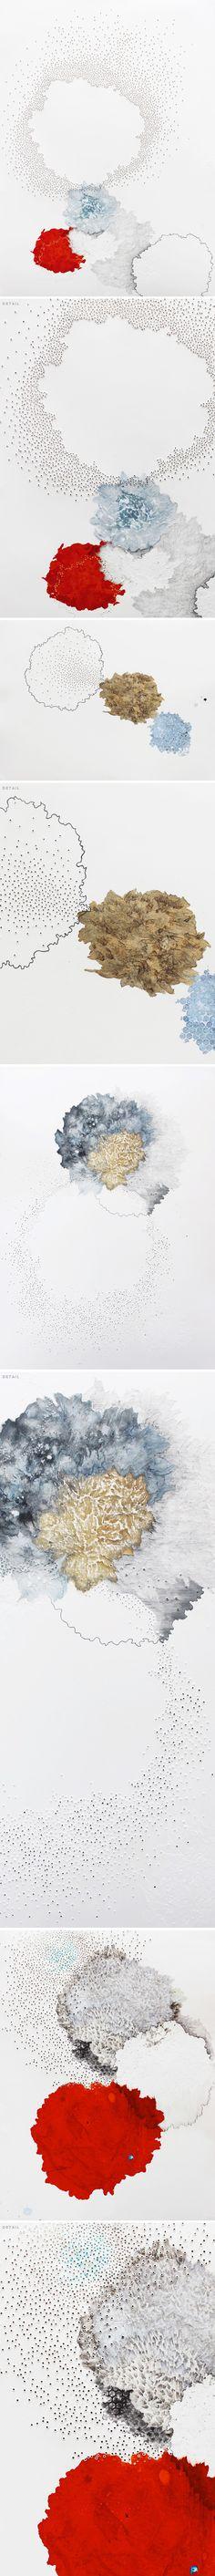 melinda schawel - ink, pencil, perforated paper <3